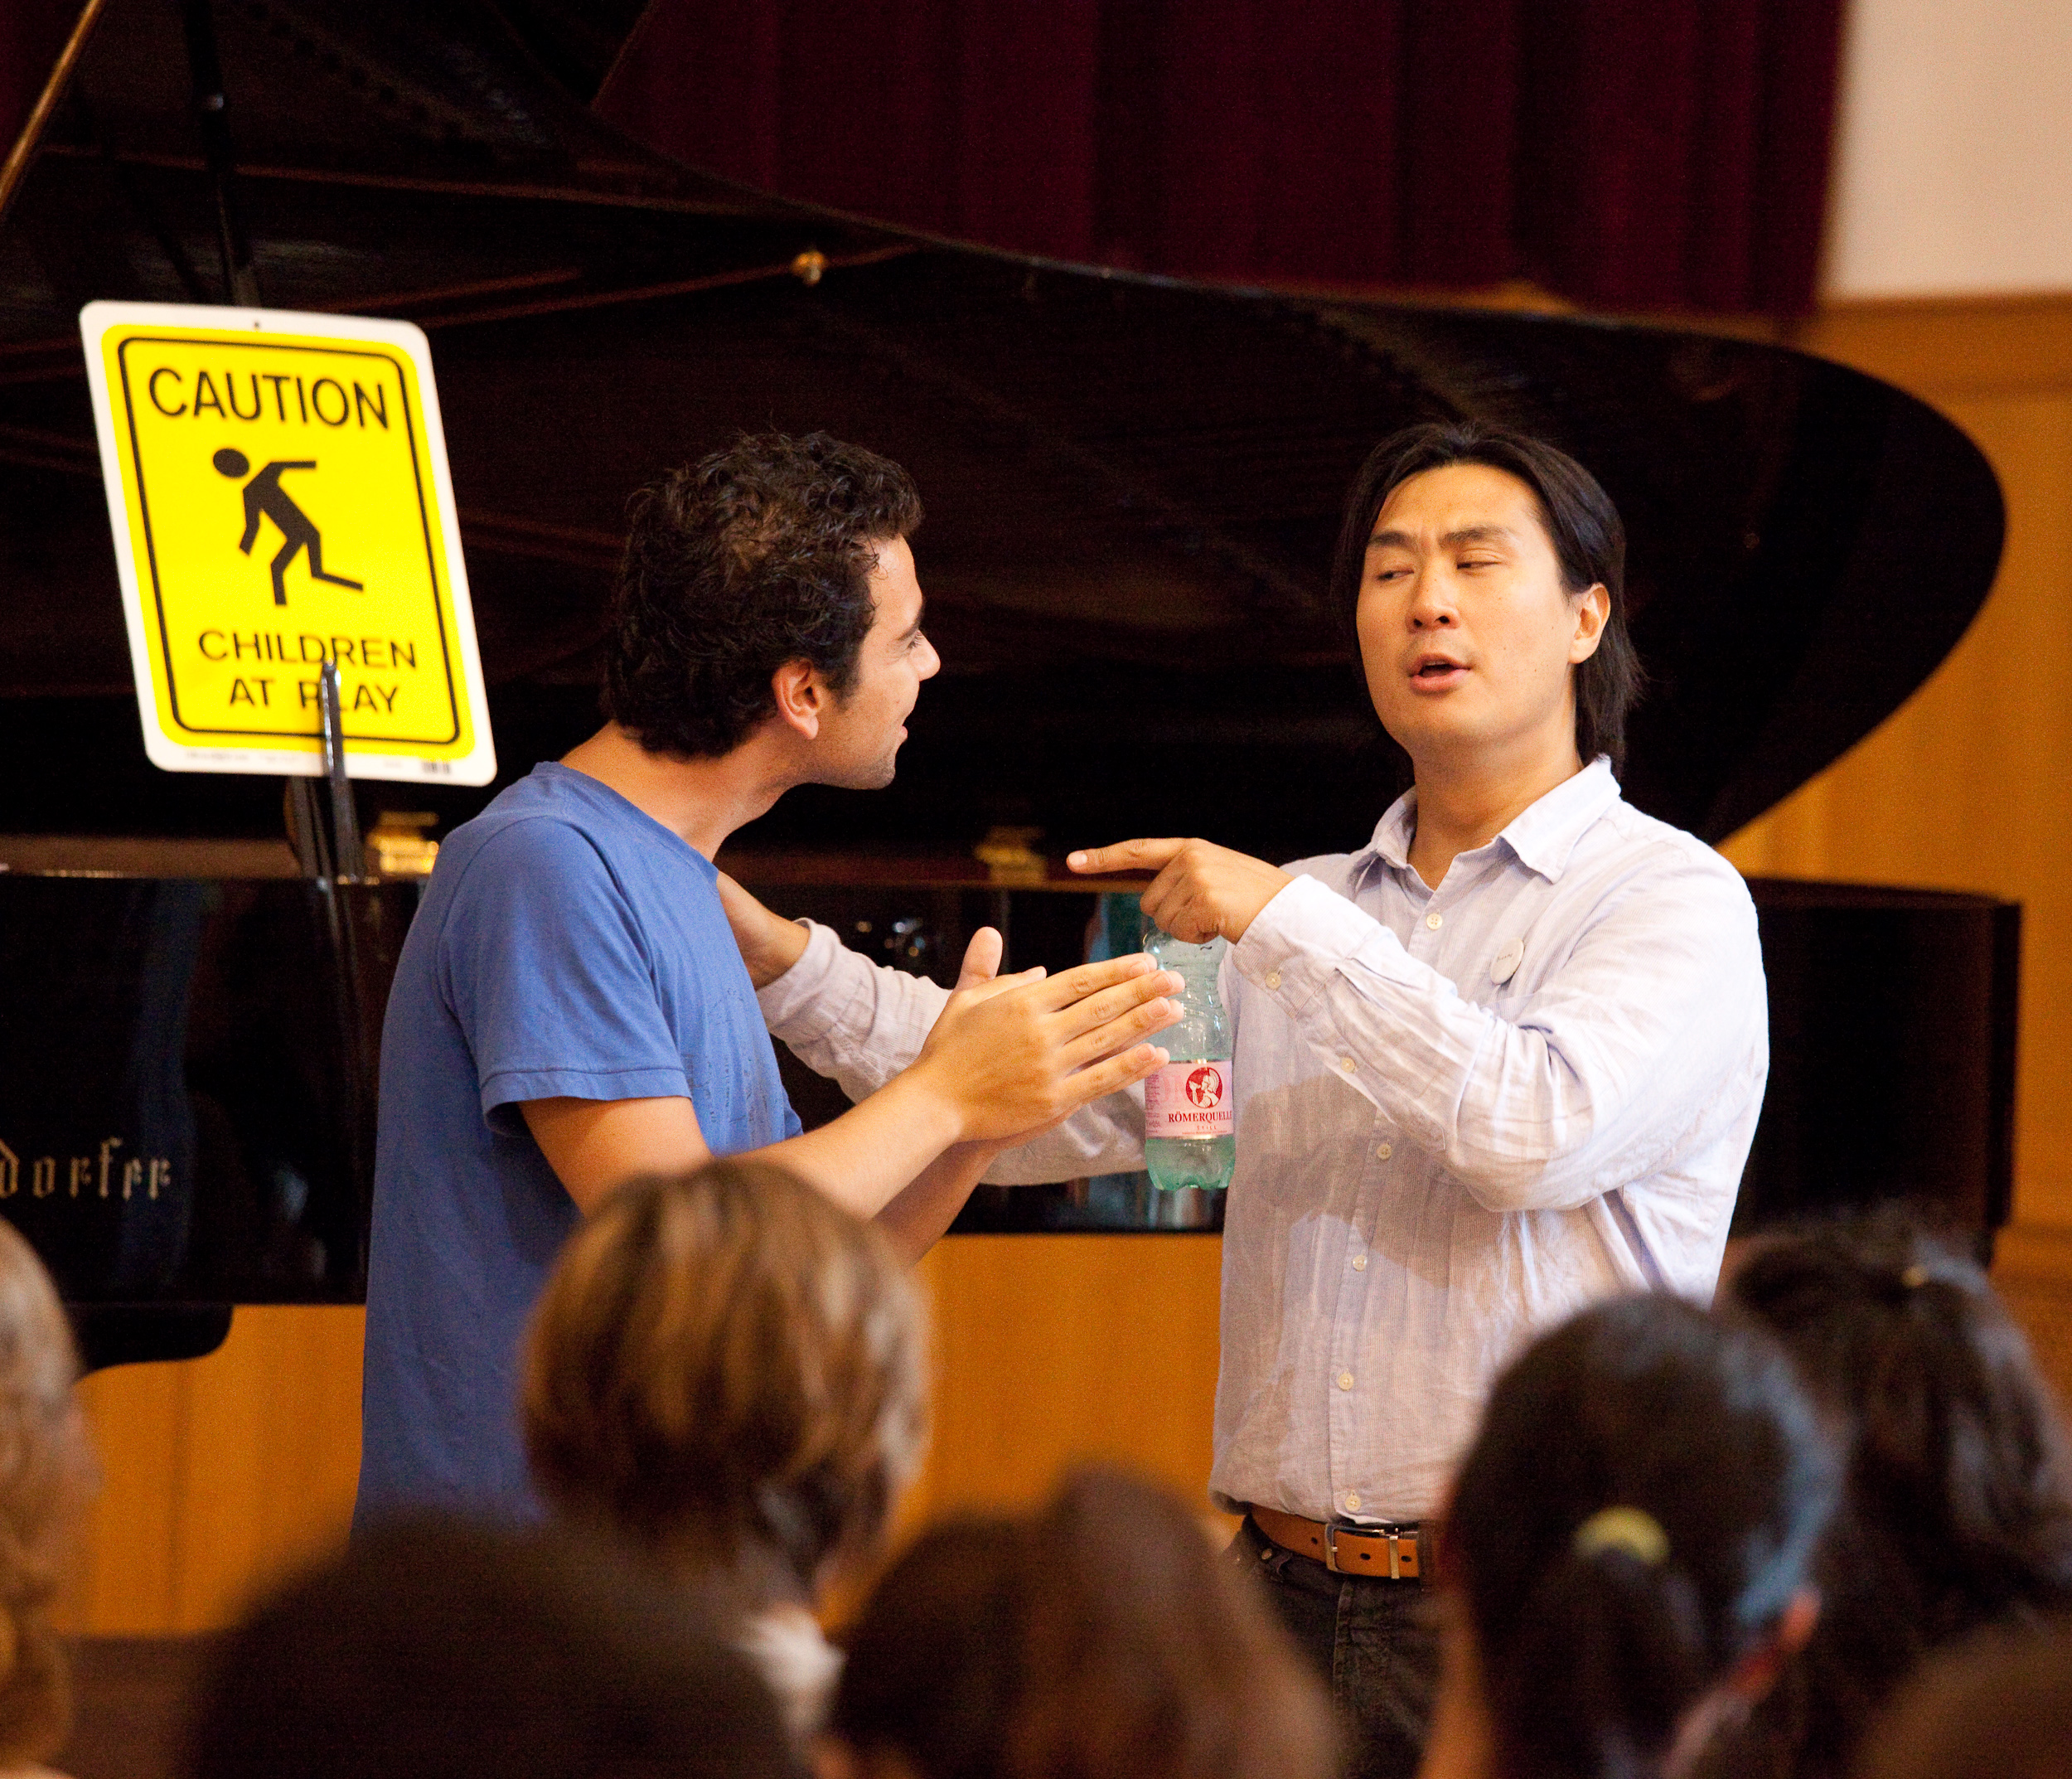 Beyond the practice room, Allegro Vivo Festival